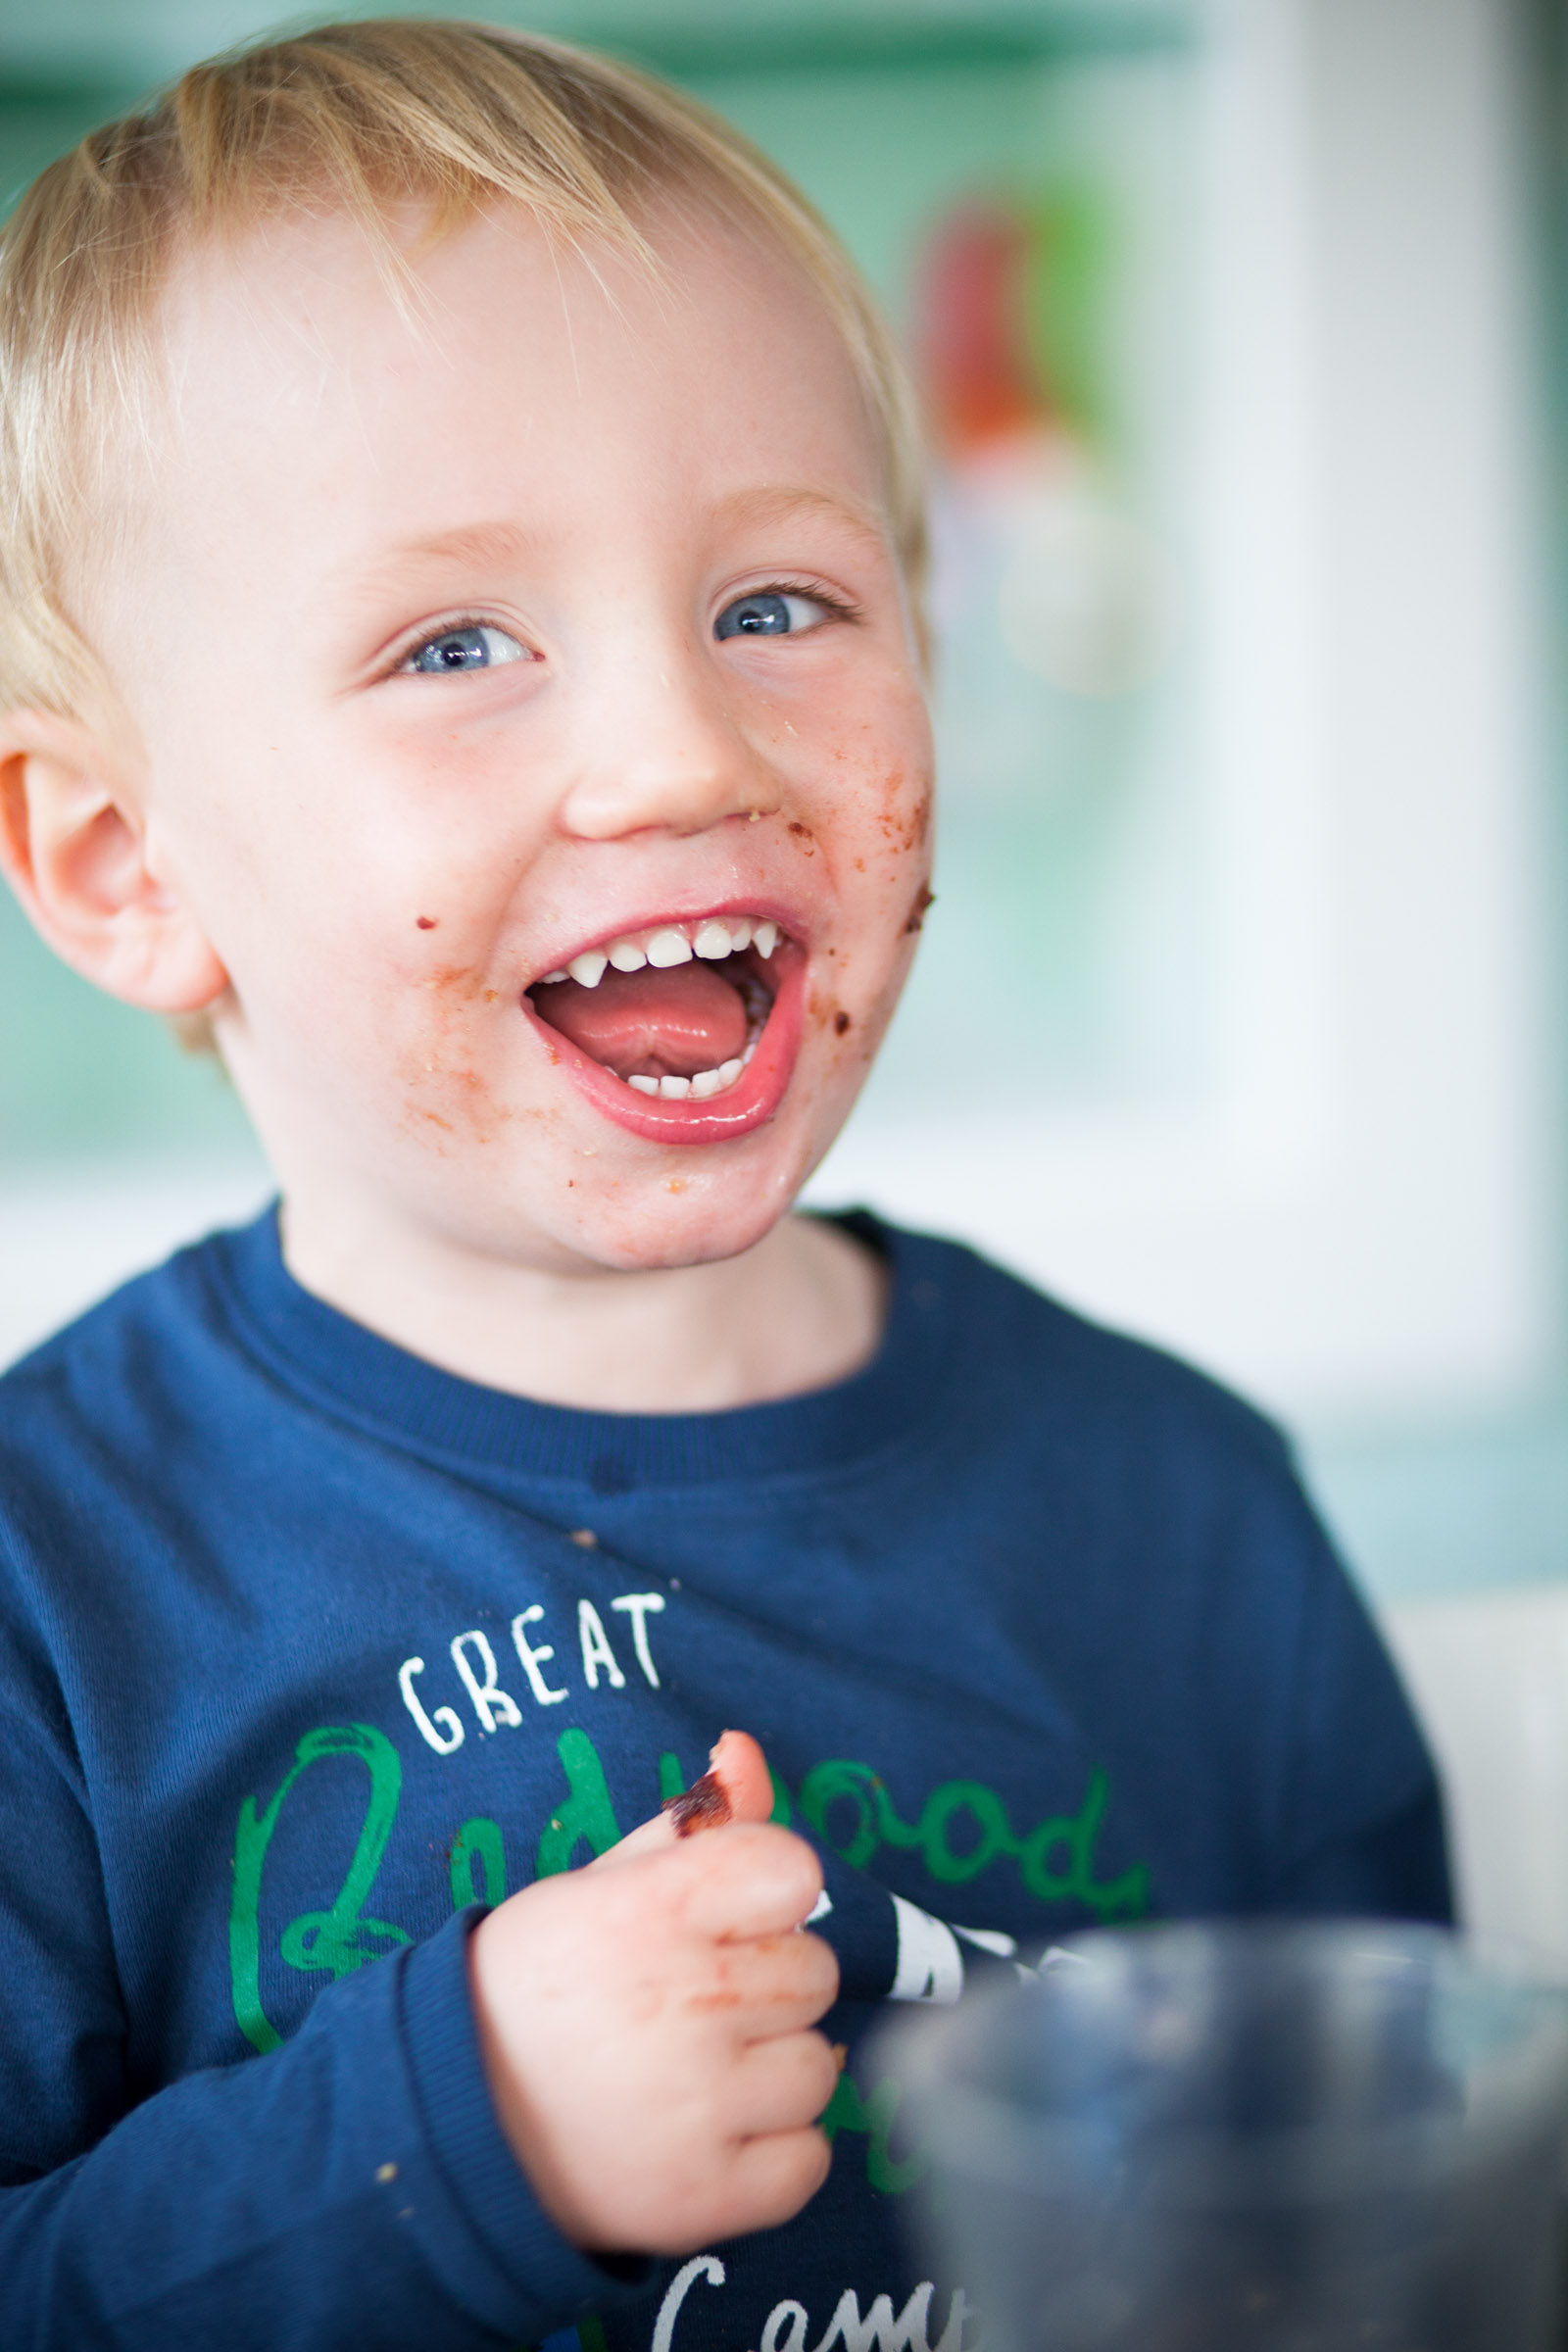 barnportratt-glad-kille-med-glass-i-ansiktet